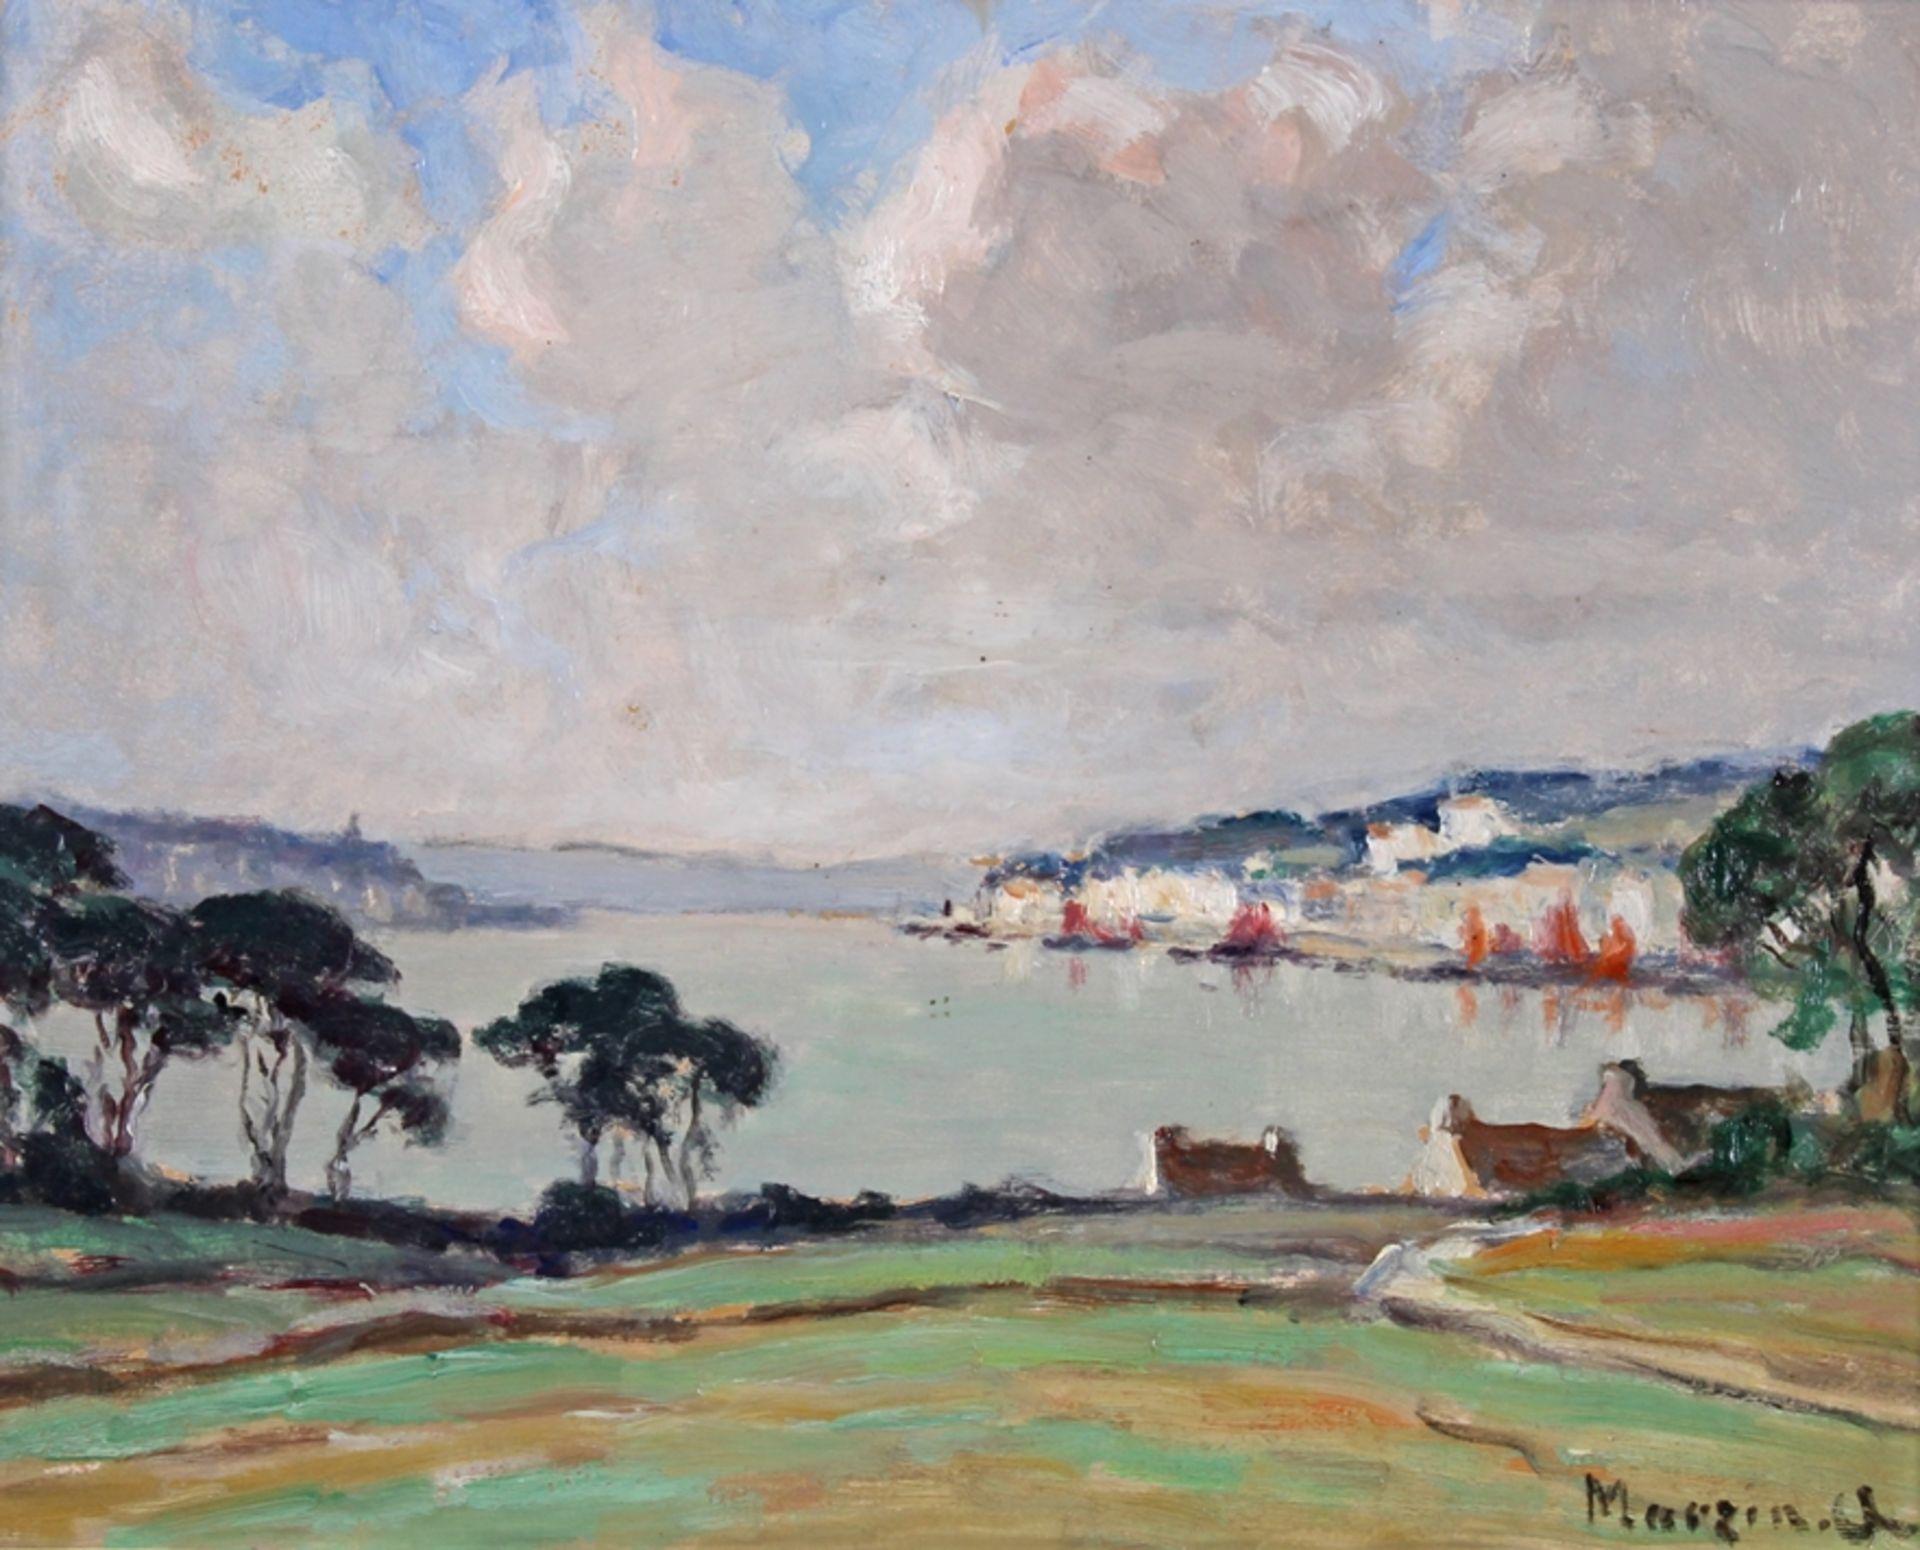 Marzin, Alfred ( Saint-Yrieix 1880-1943 Nantes, französischer Künstler, der ausschließlich Motive a